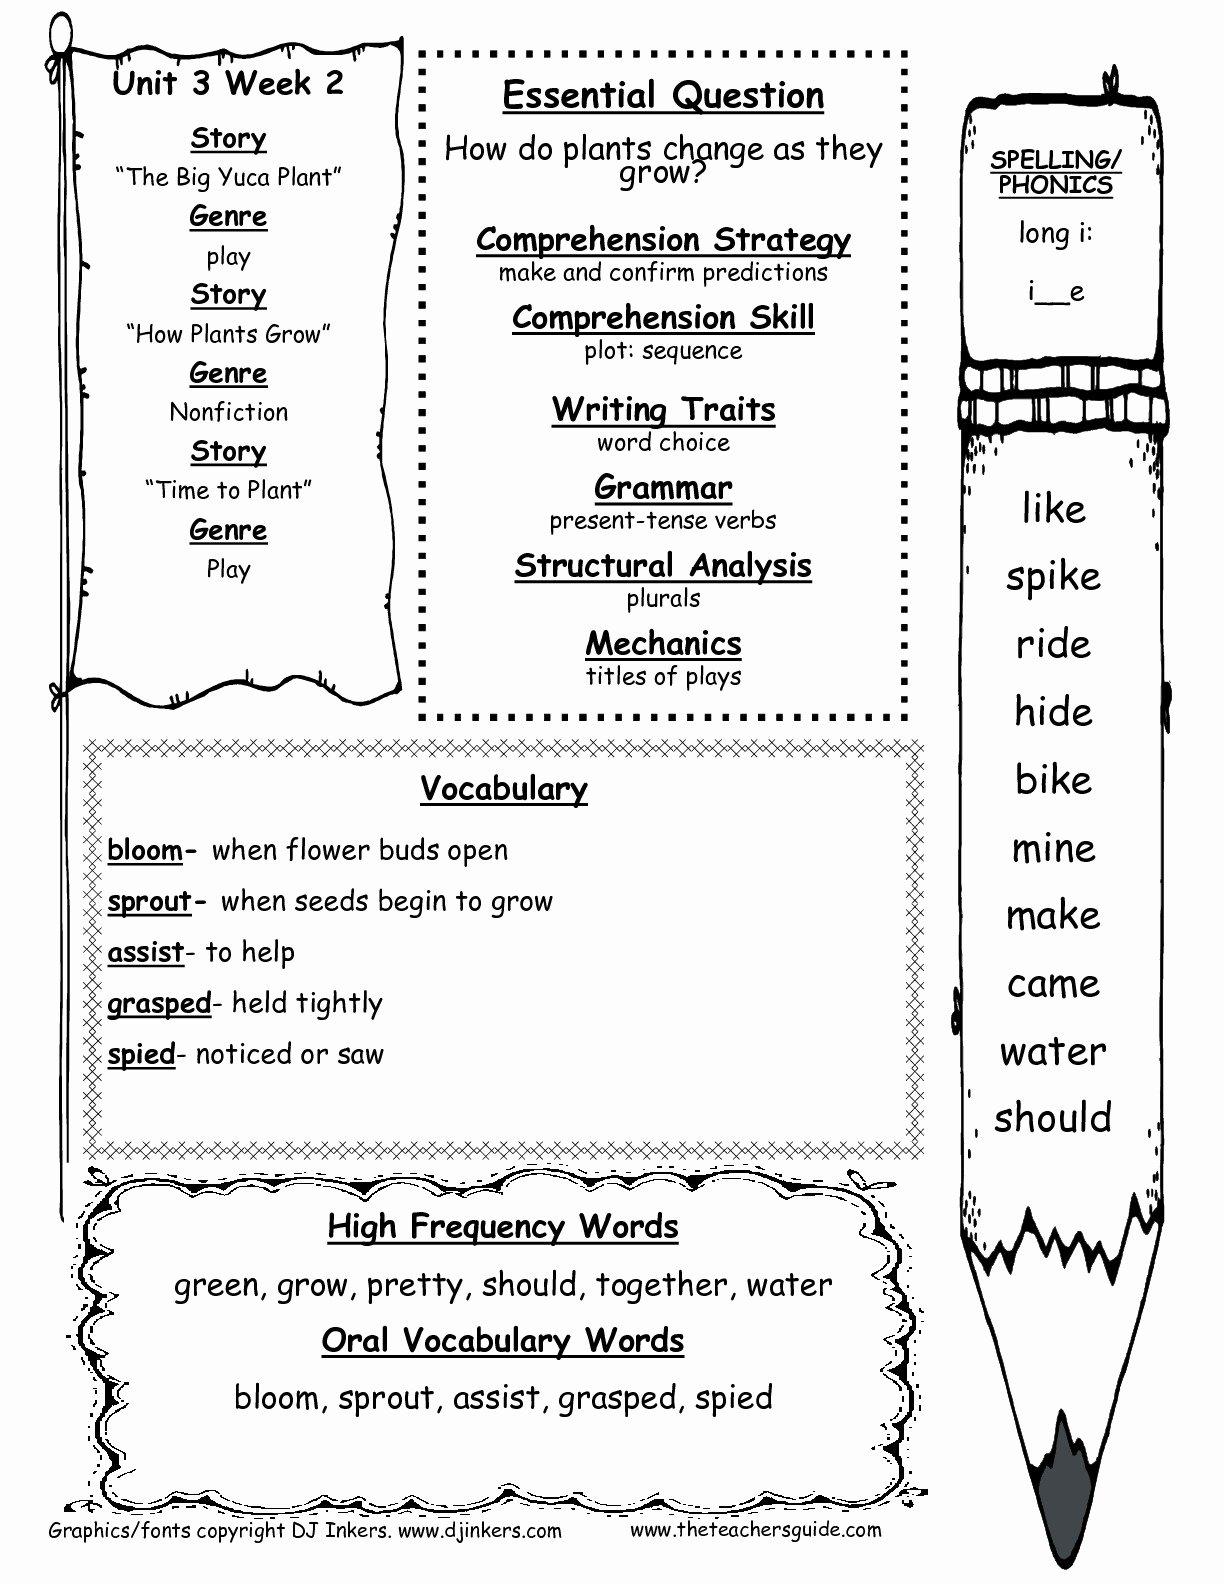 50 Science Worksheet For 1st Grade